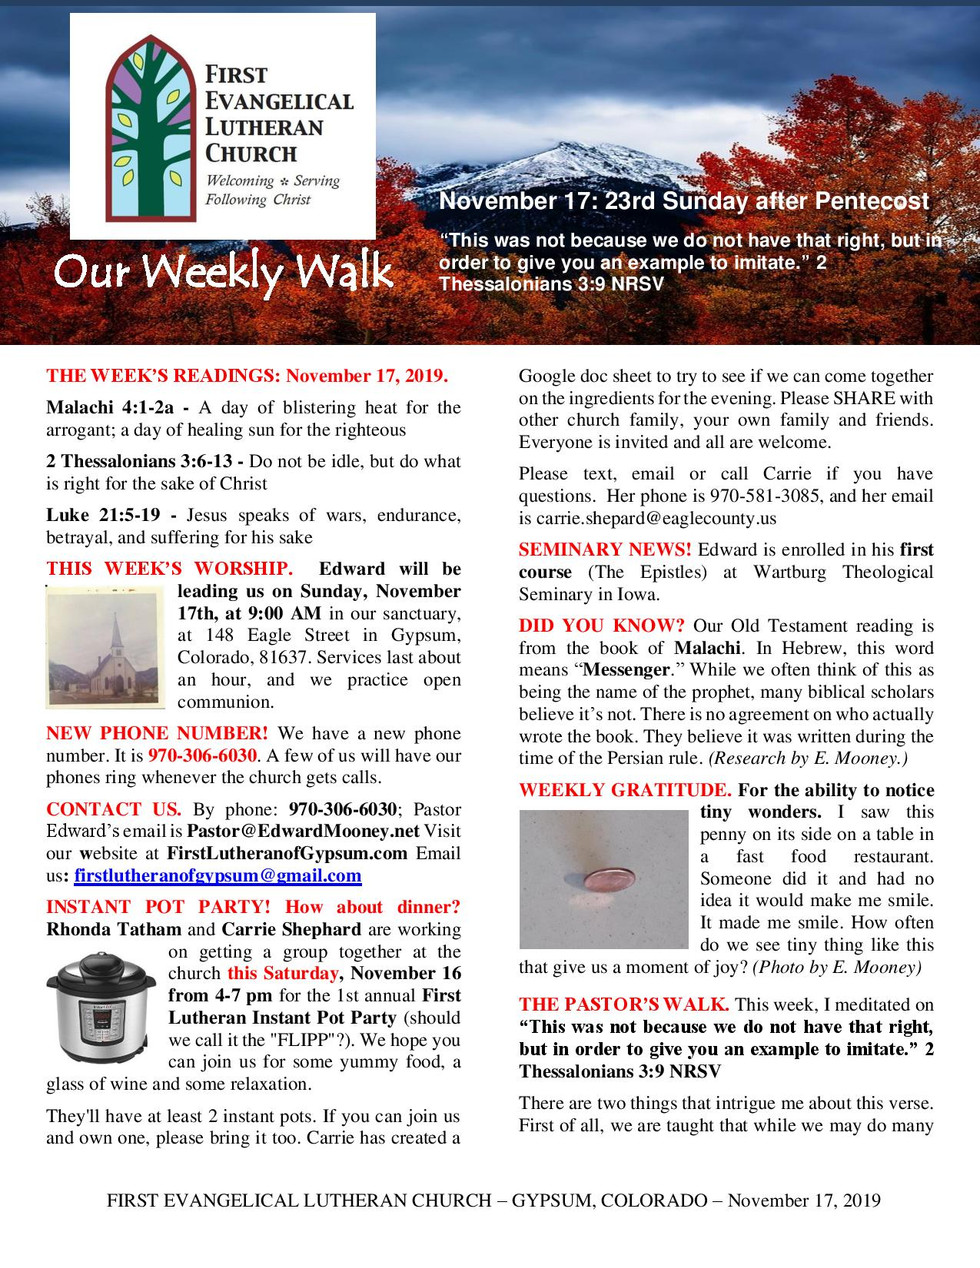 Newsletter - November 17, 2019, page 1